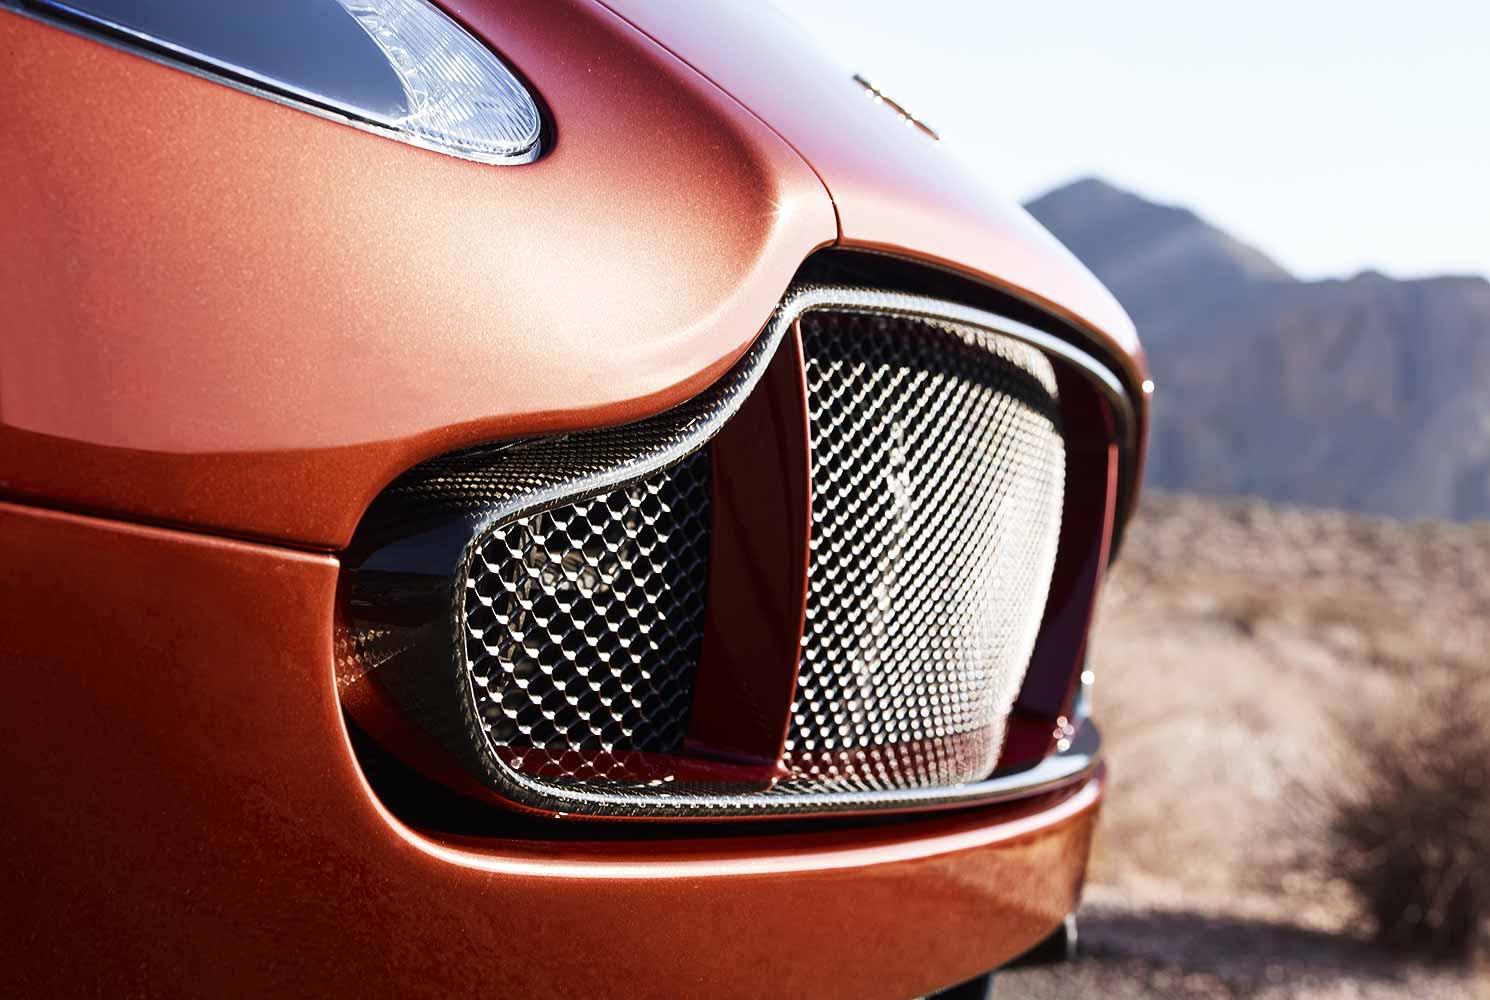 2014 Aston Martin V12 Vantage S Roadster 27